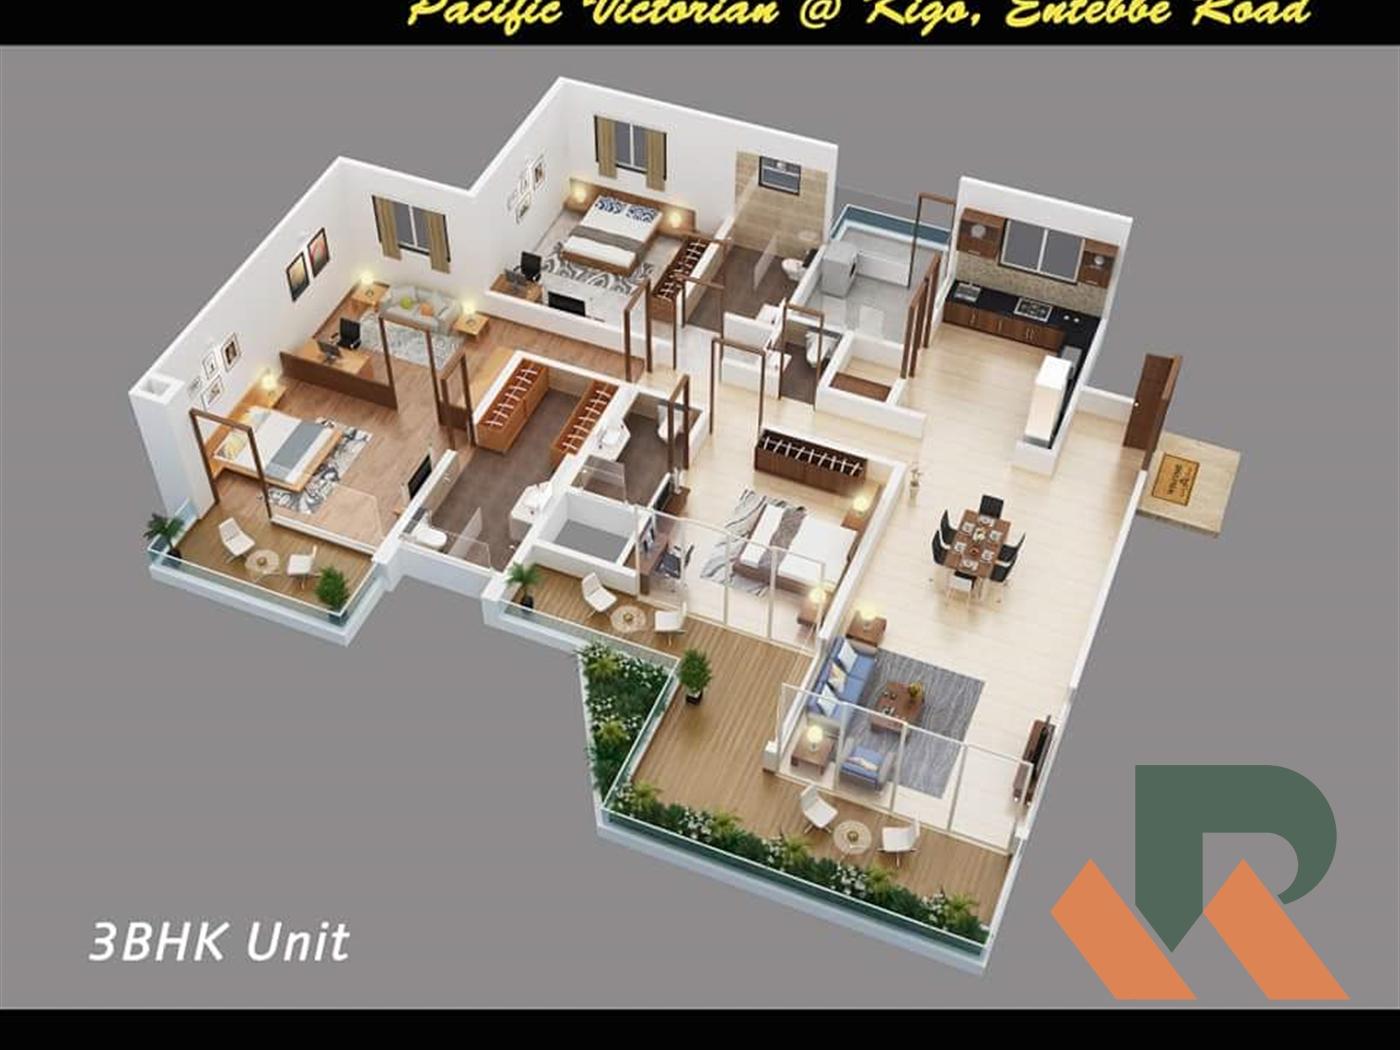 Apartment for sale in Kigo Wakiso